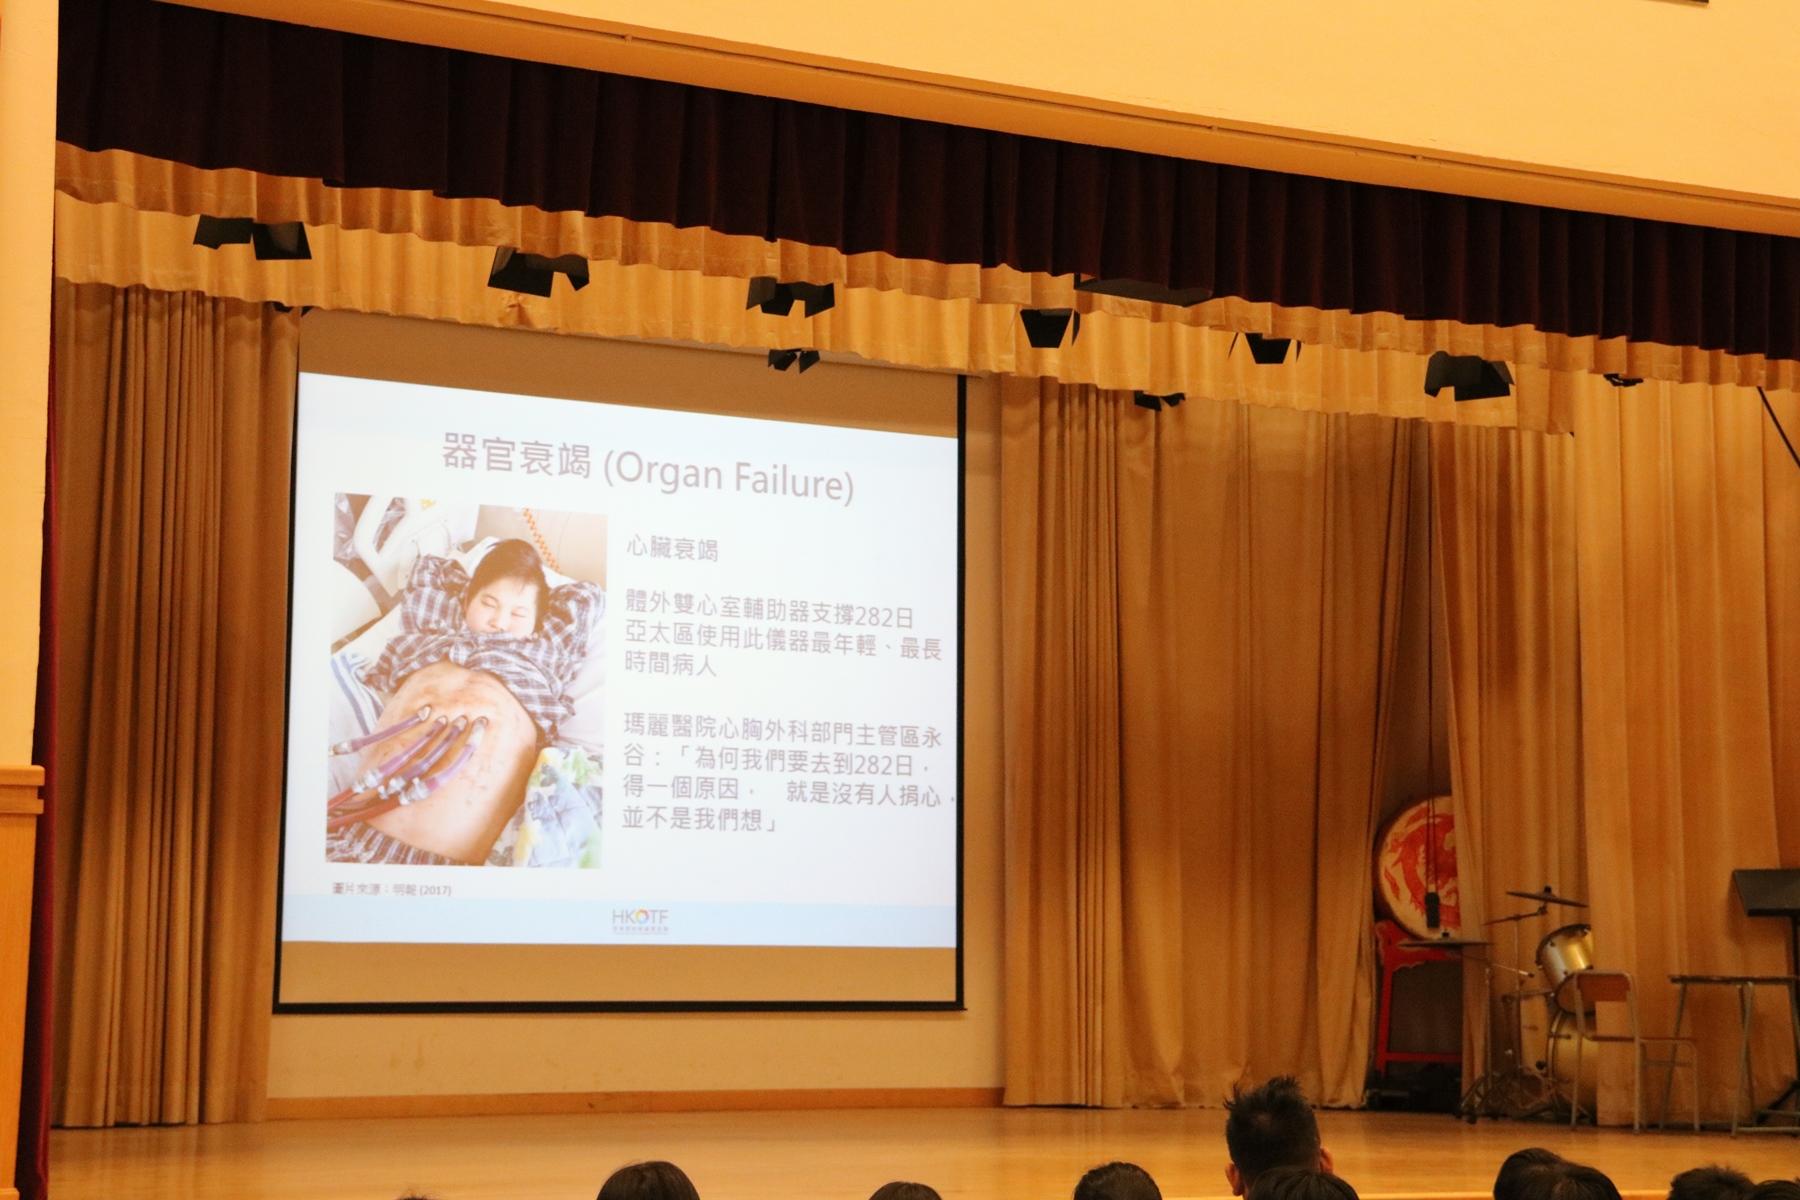 http://npc.edu.hk/sites/default/files/img_6903.jpg